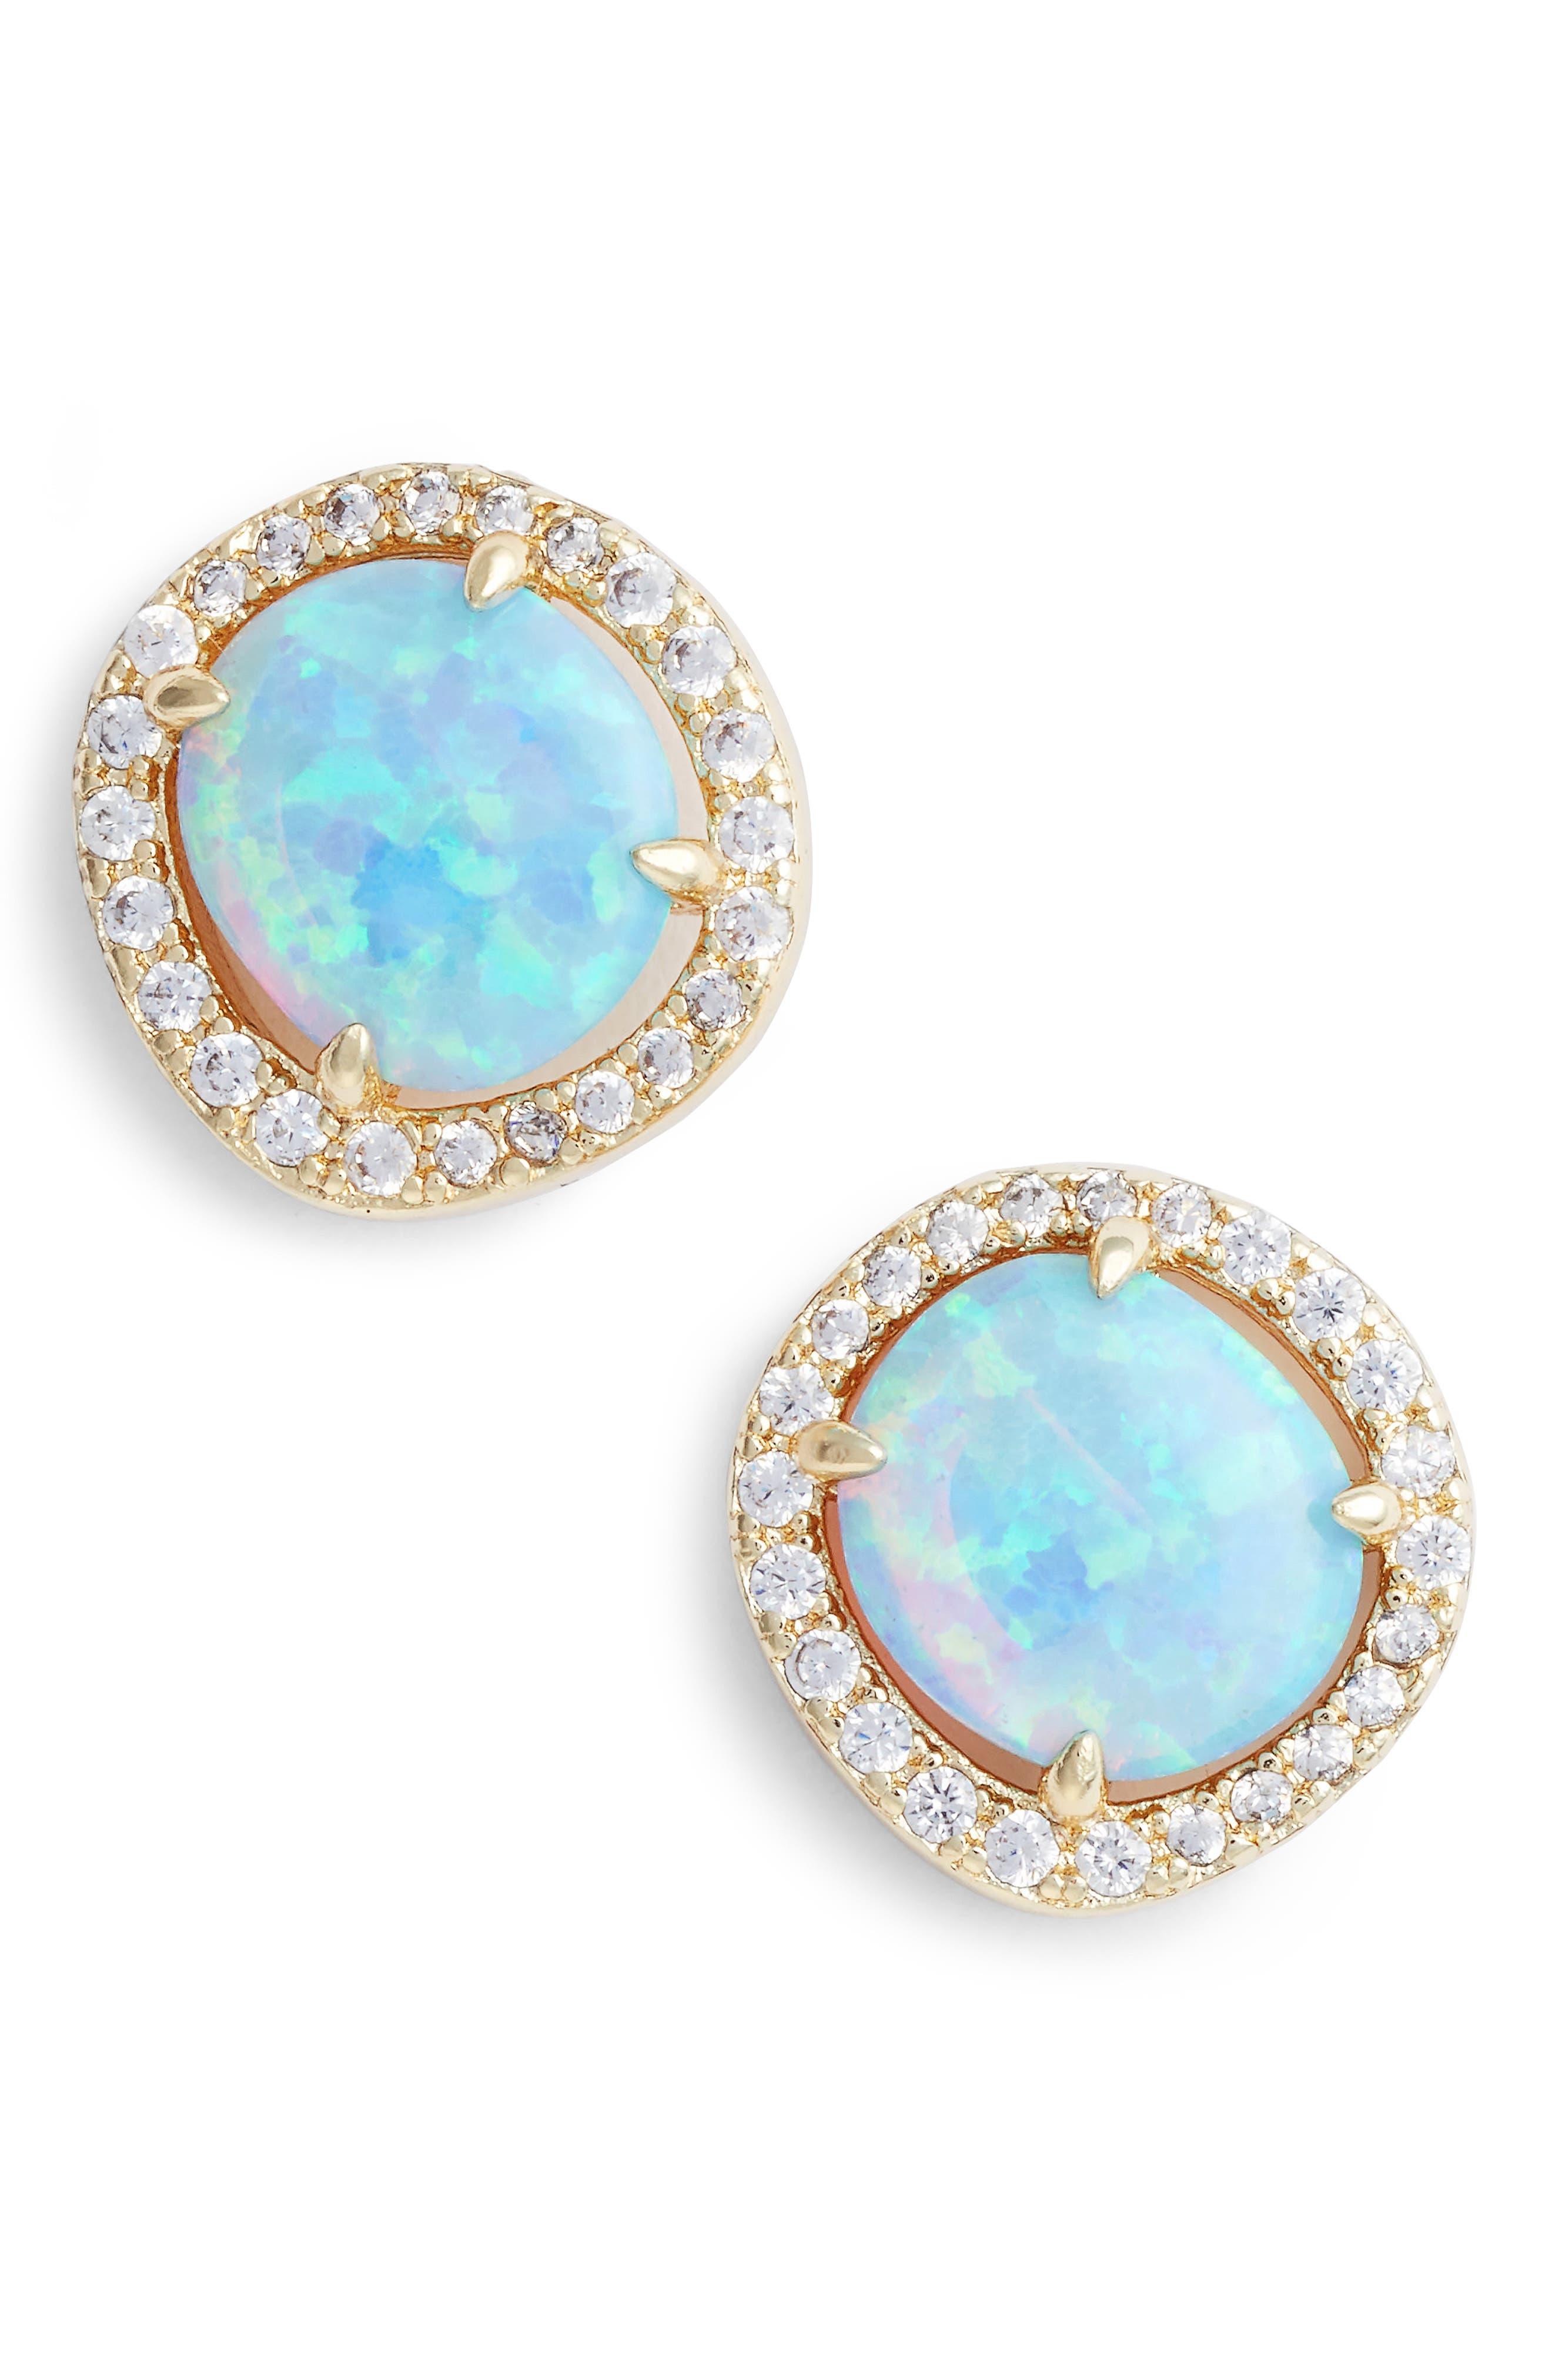 Main Image - Melinda Maria Sarah Louise Opal Stud Earrings